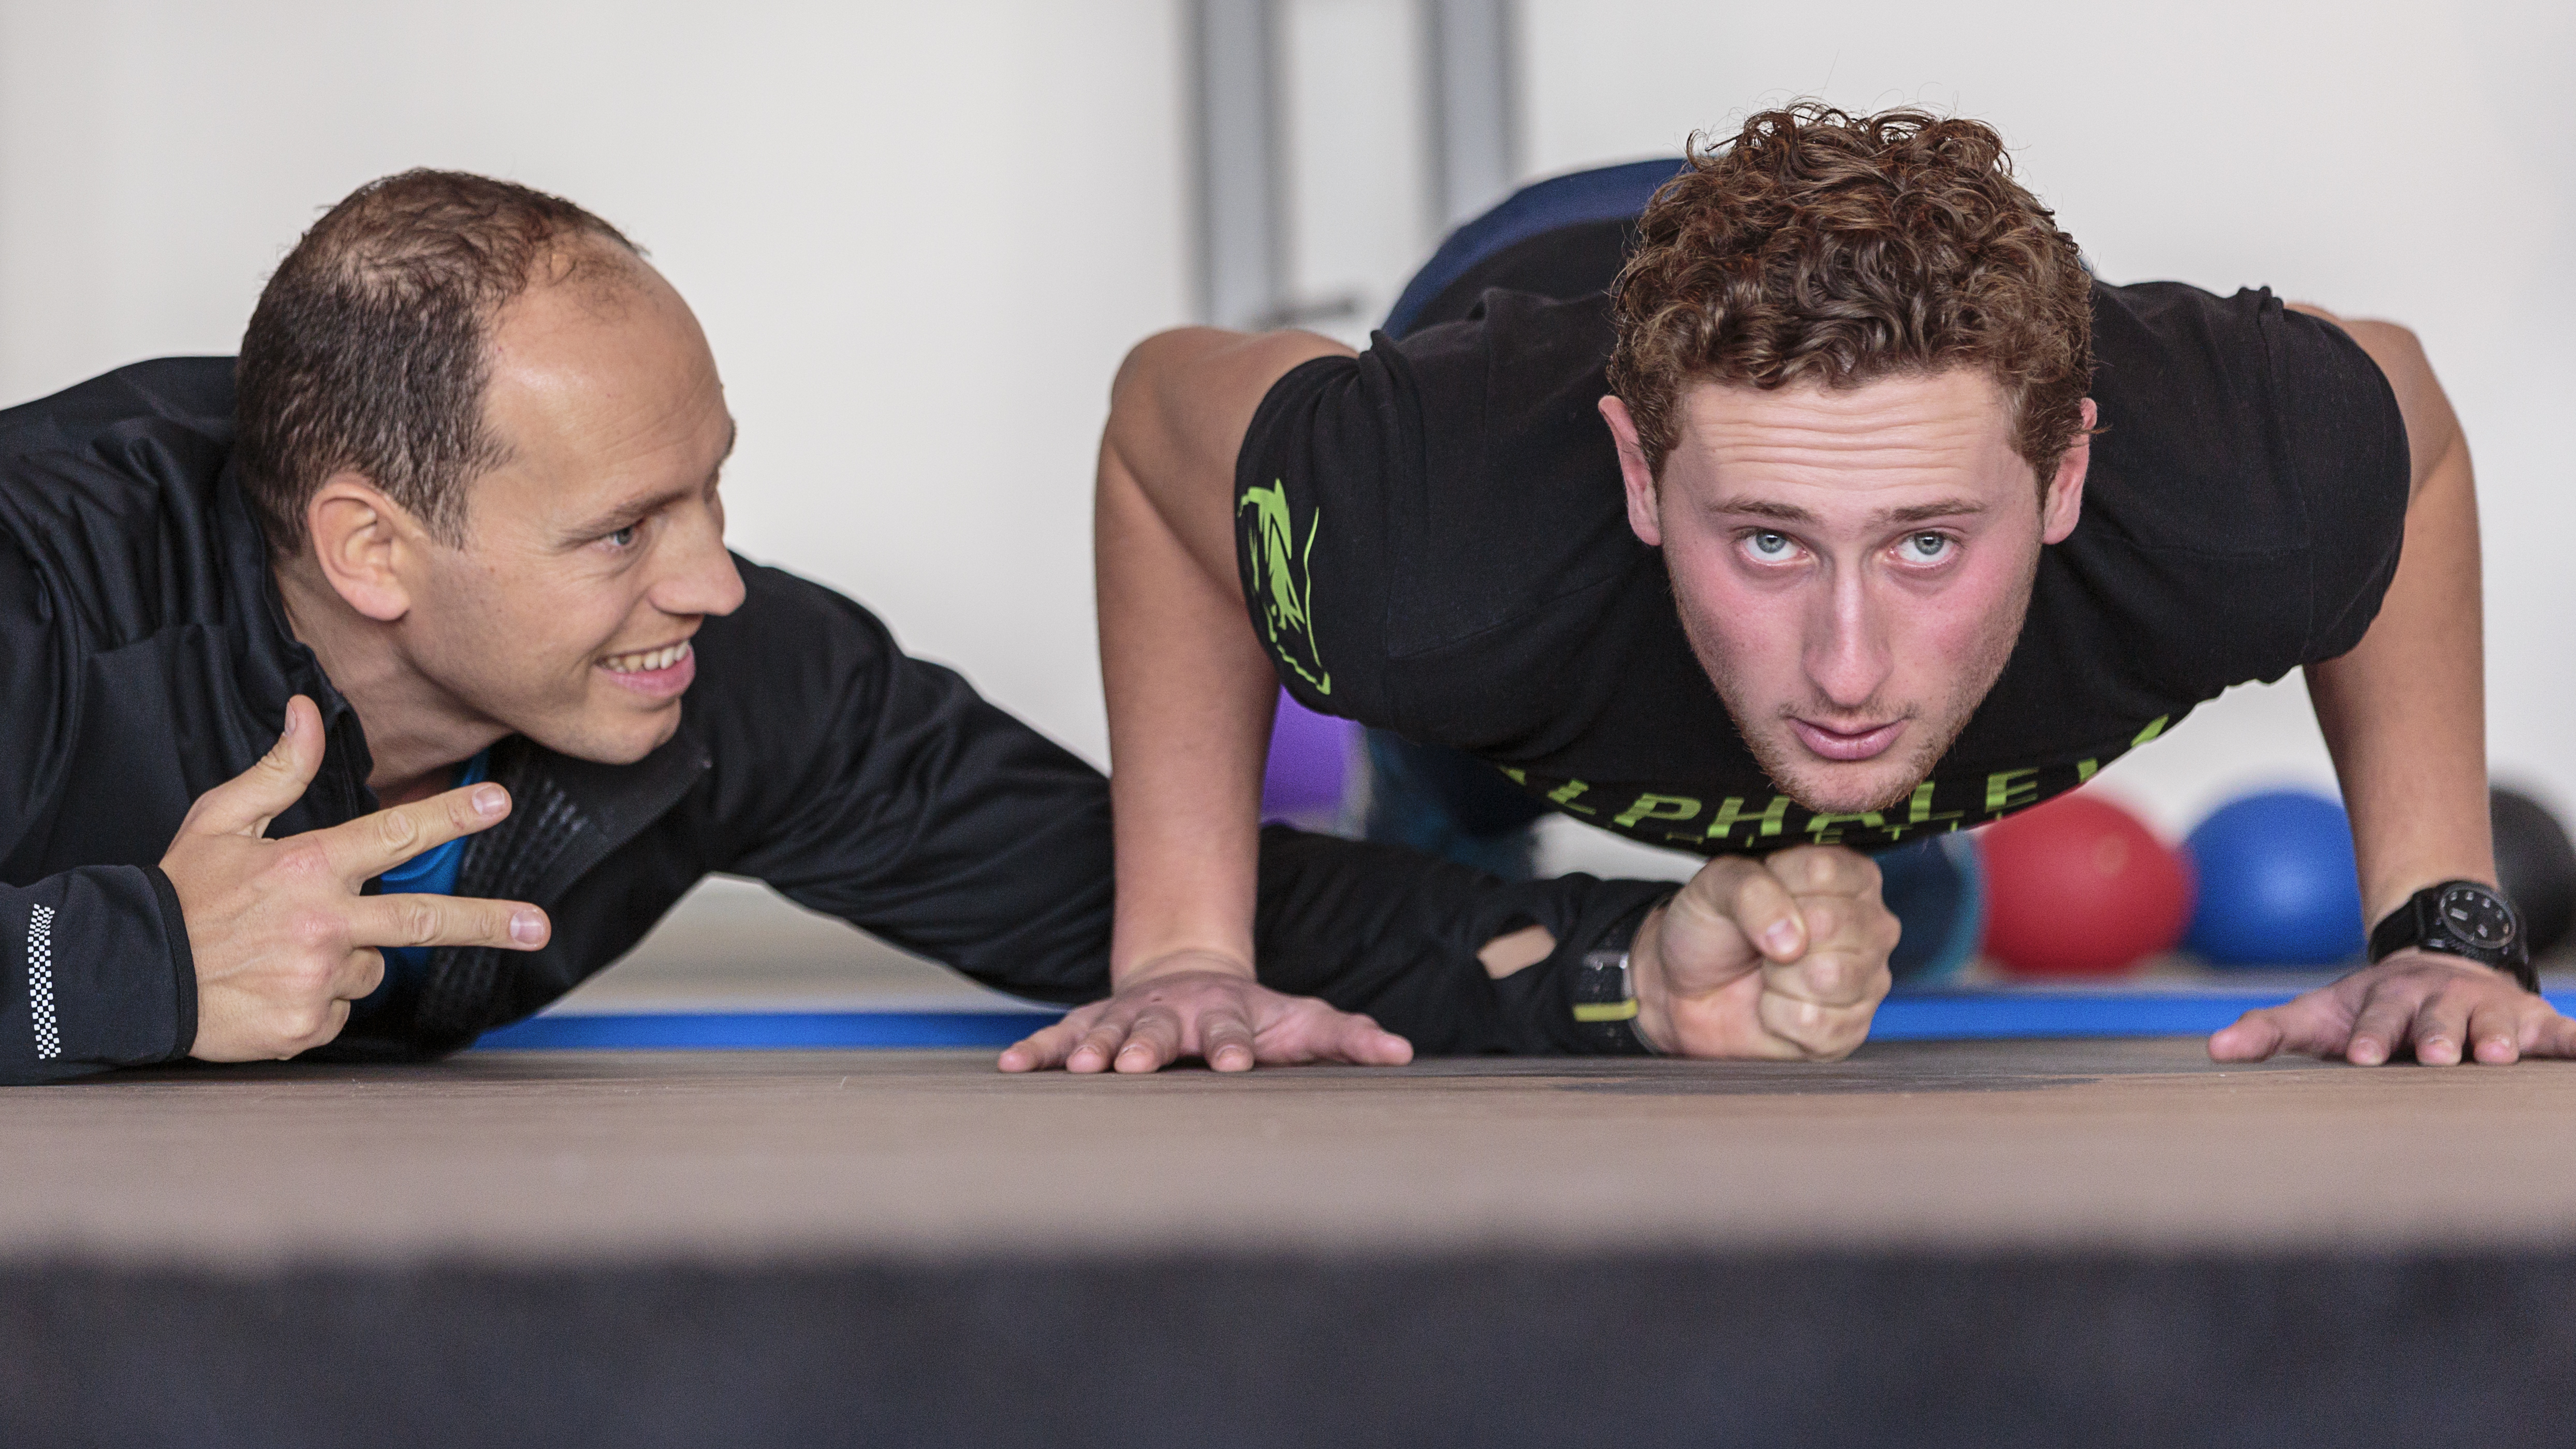 Military Fit, Gino Pasutto, personal trainer in Scheveningen is de expert